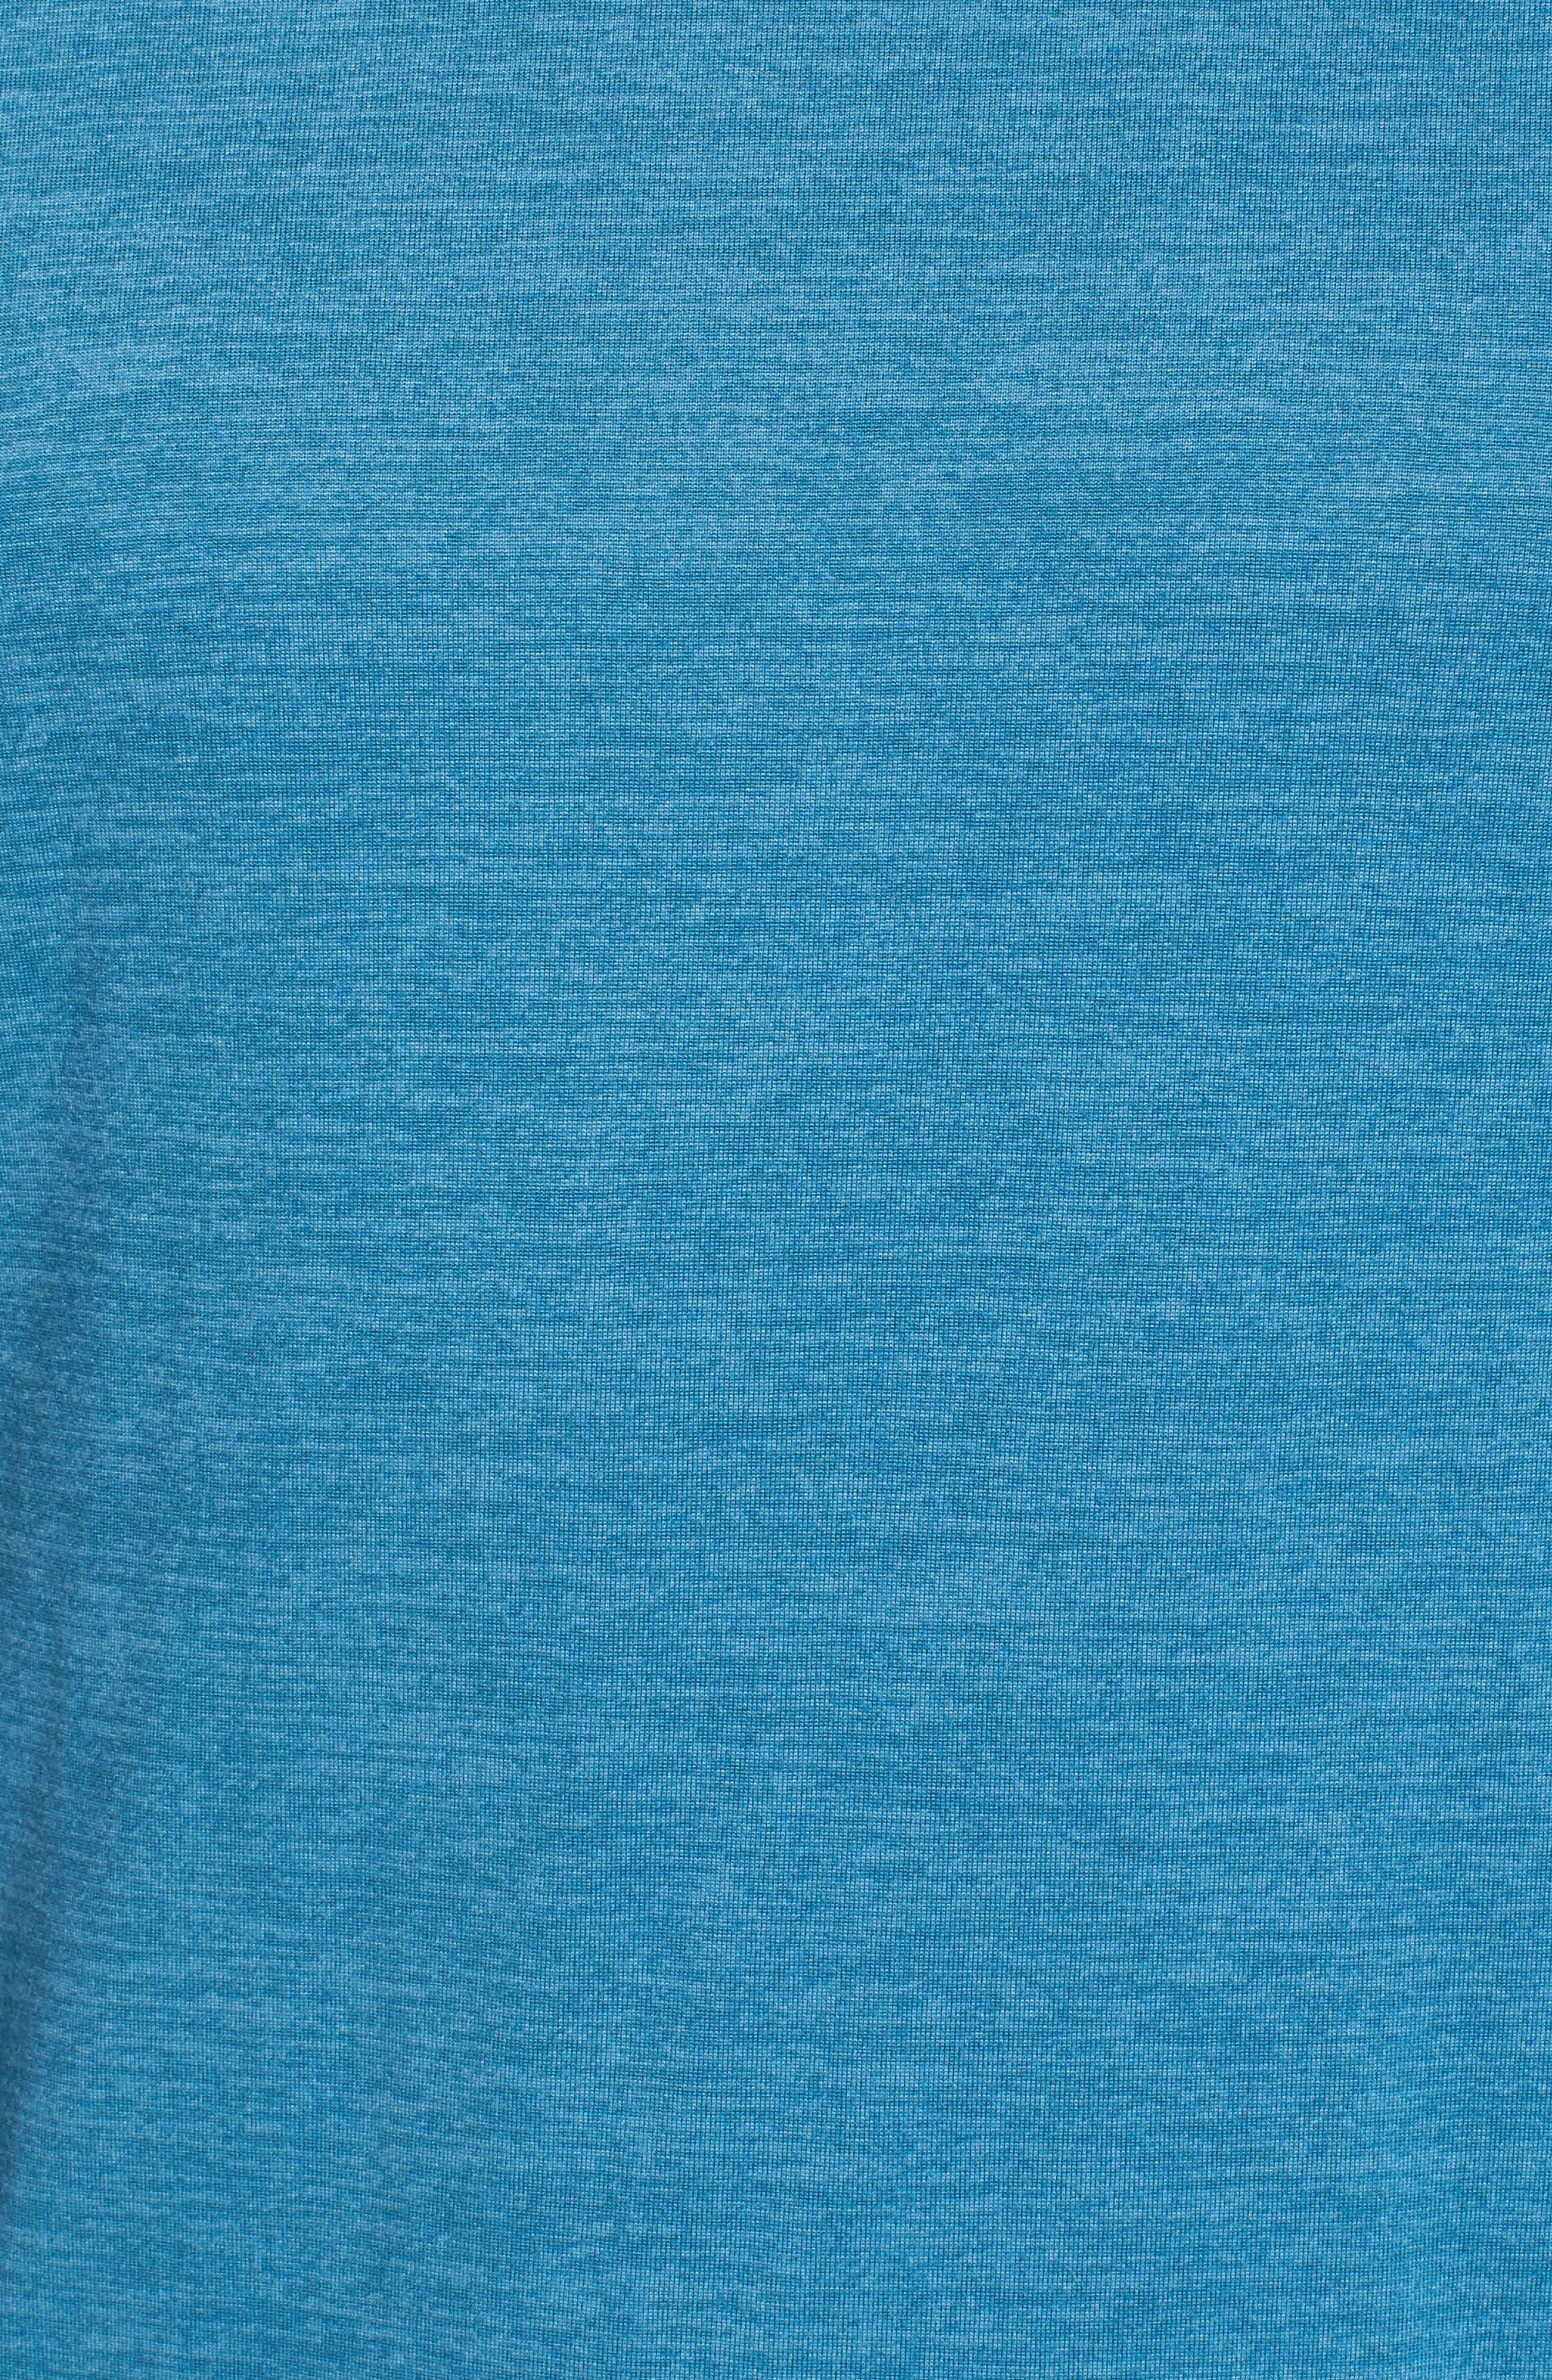 Larosite Performance Hoodie,                             Alternate thumbnail 5, color,                             Blue Granite Melange